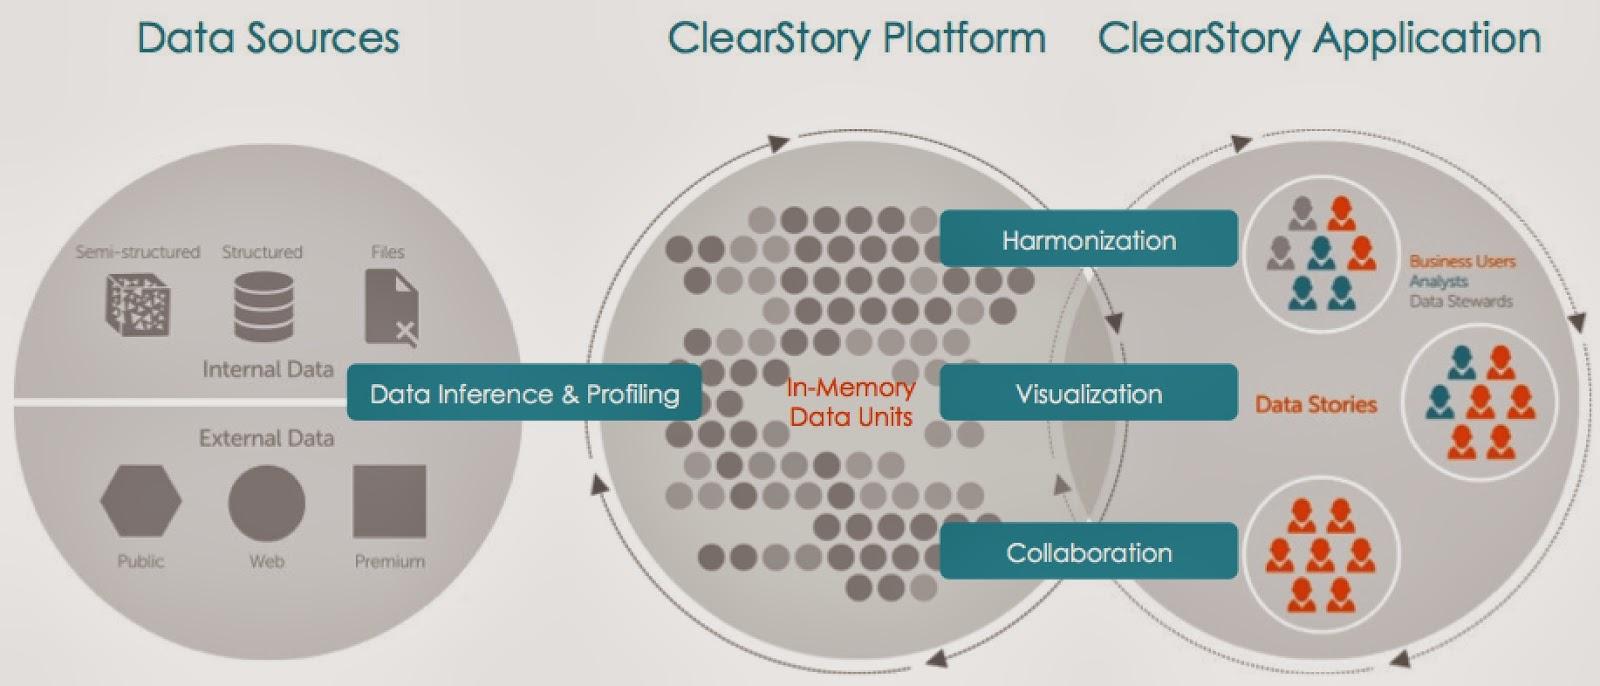 ClearStory platform